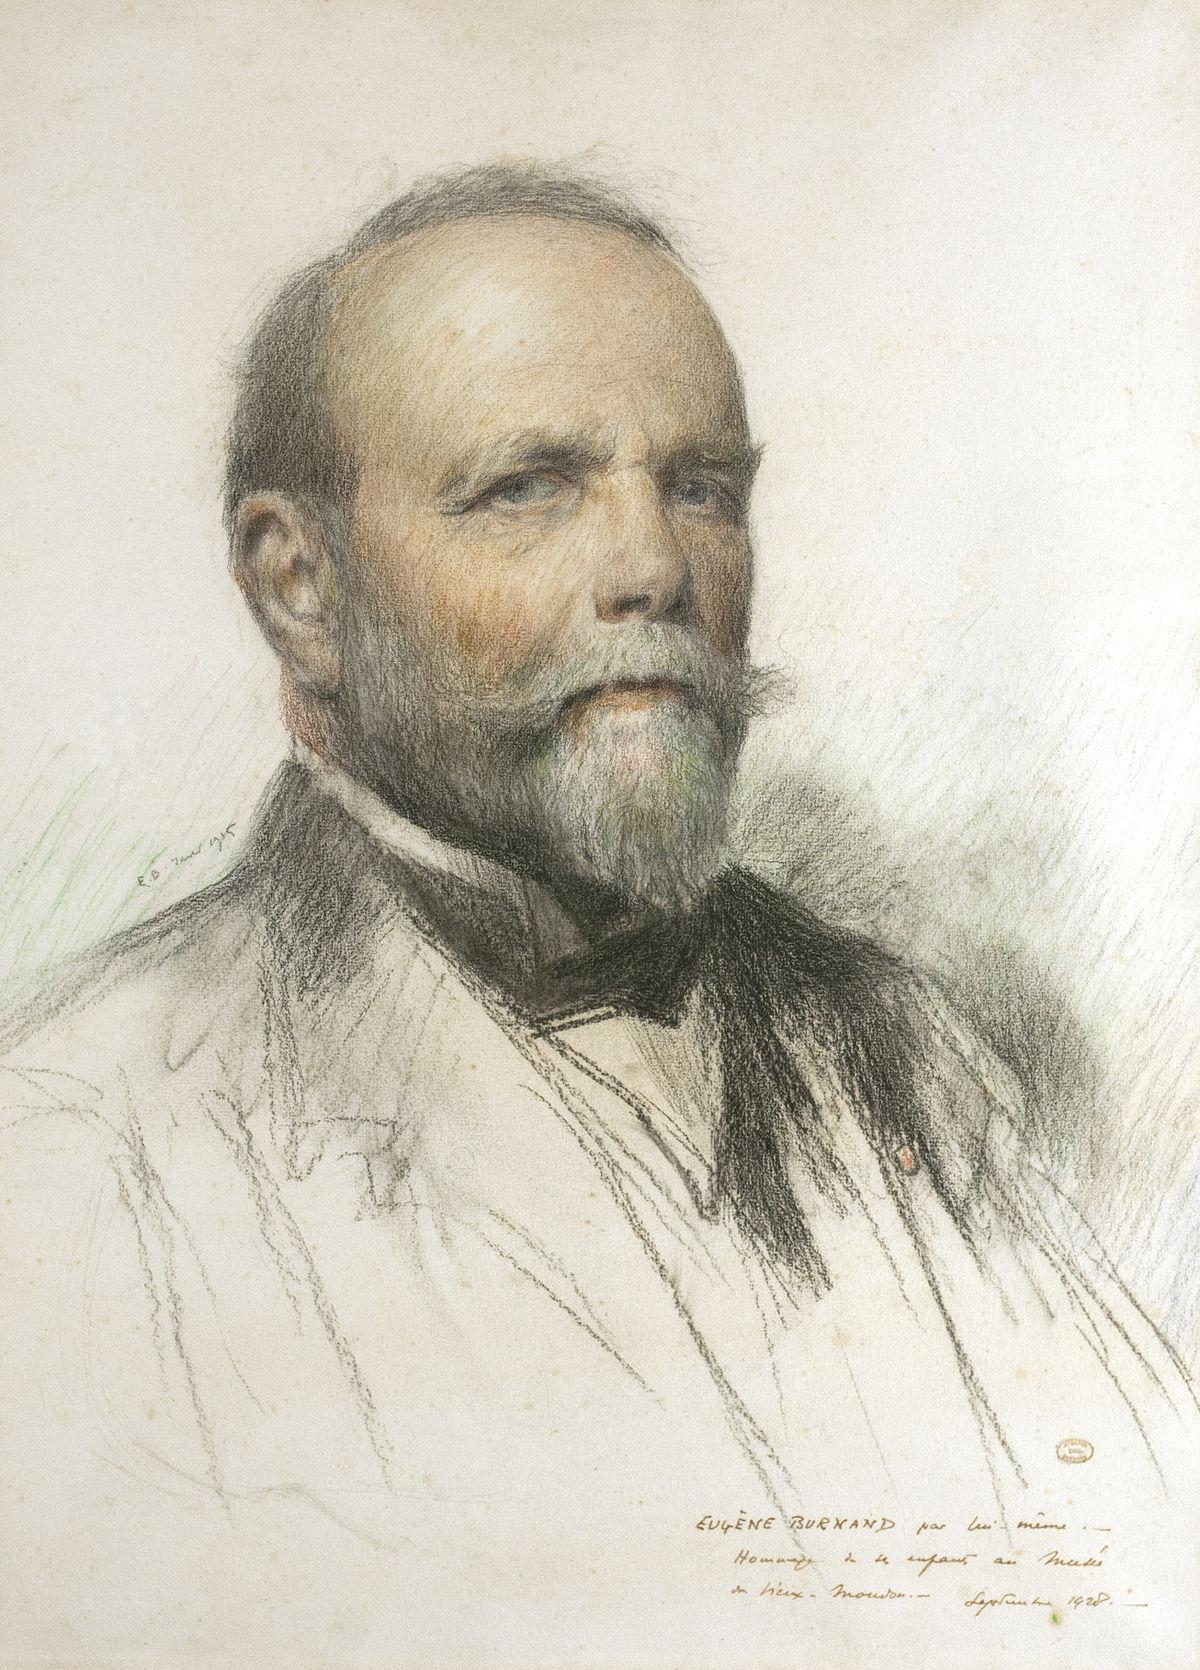 Eugène_Burnand_Self_portrait_1915.jpg